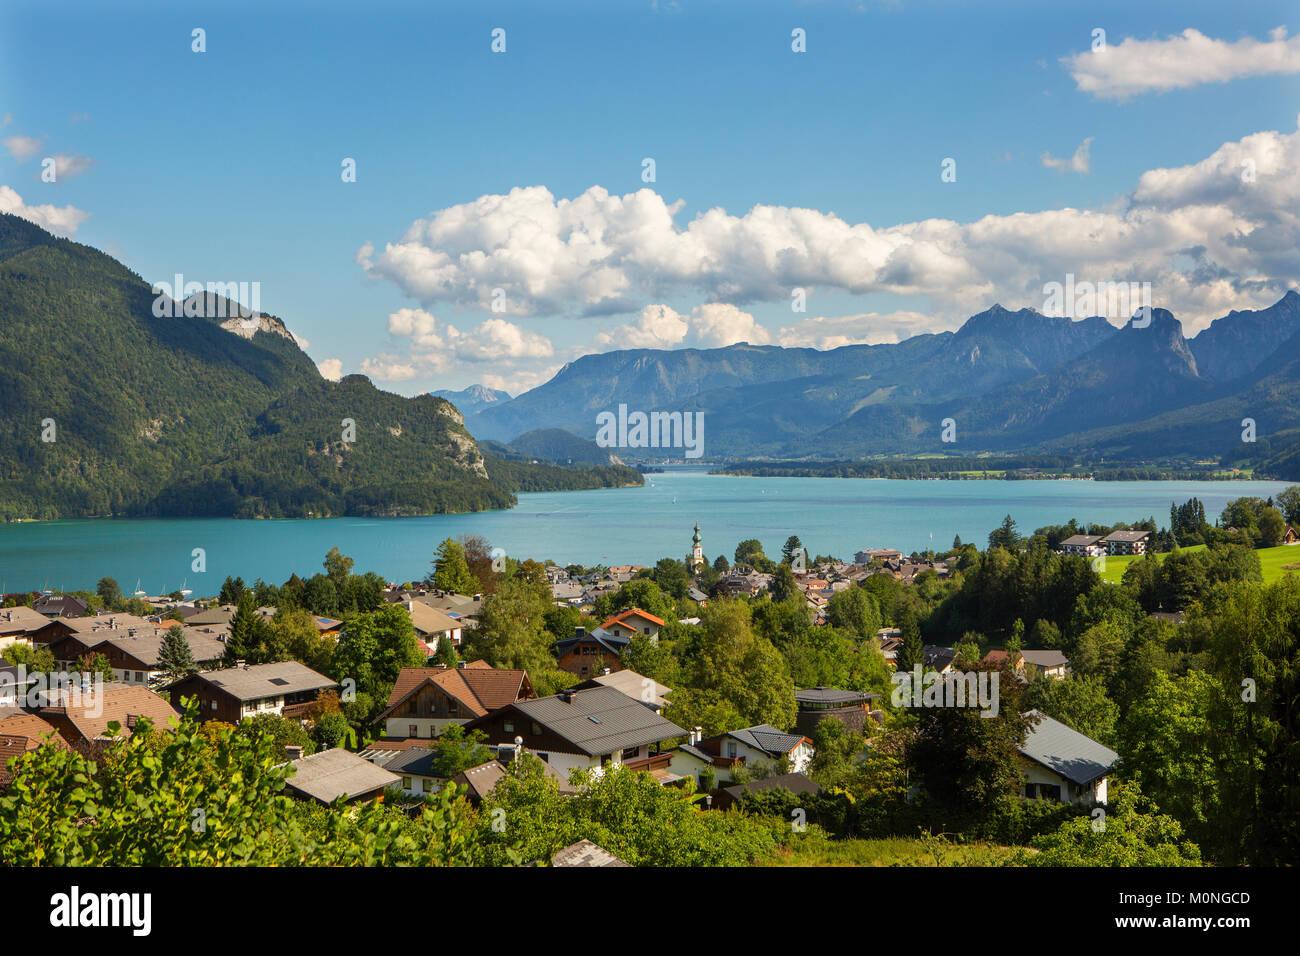 Austria, Salzburg State, Salzkammergut, Sankt Gilgen, Lake Wolfgangsee - Stock Image